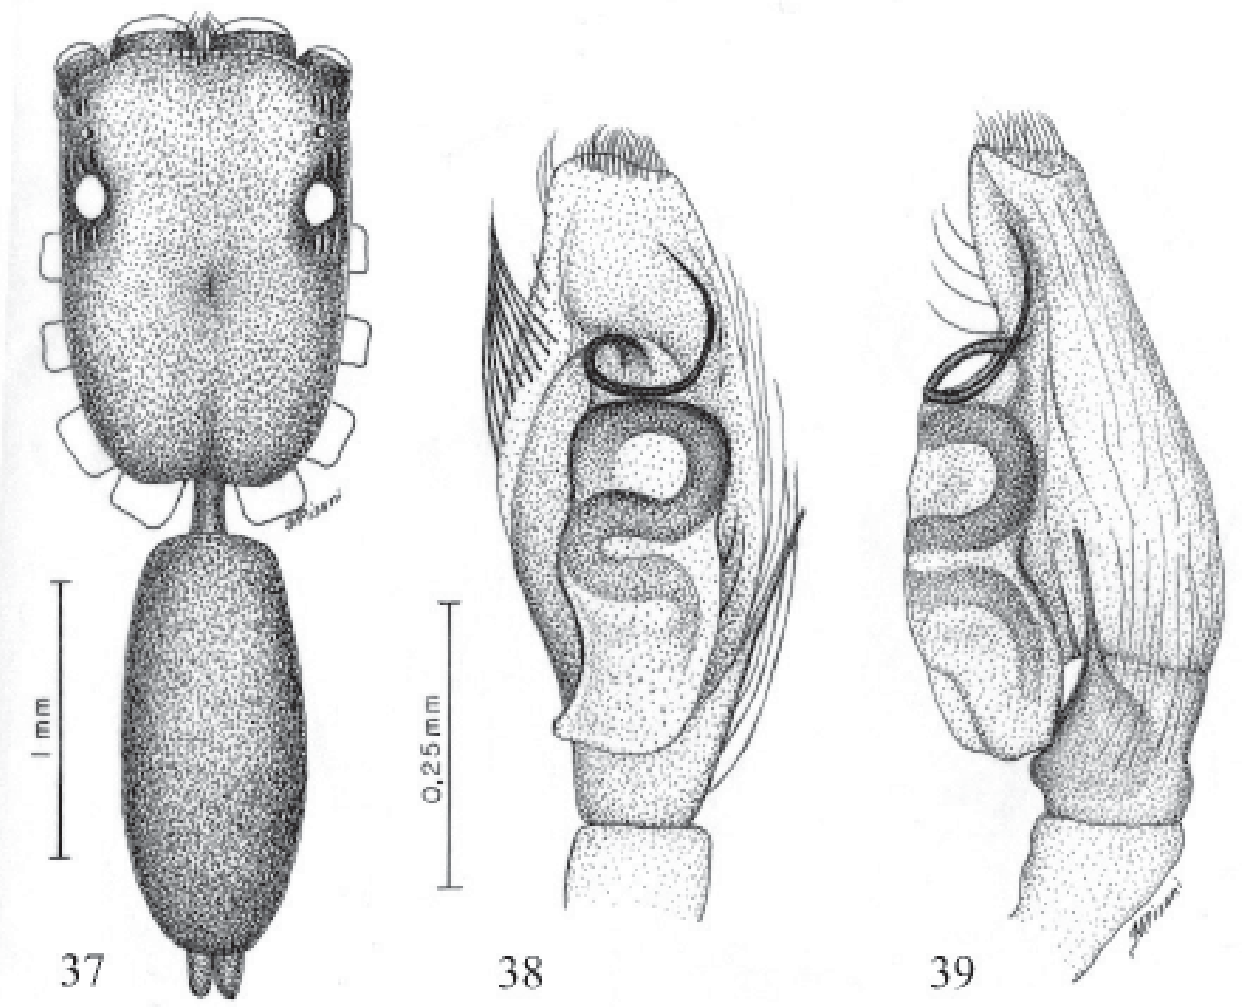 figure 37-39